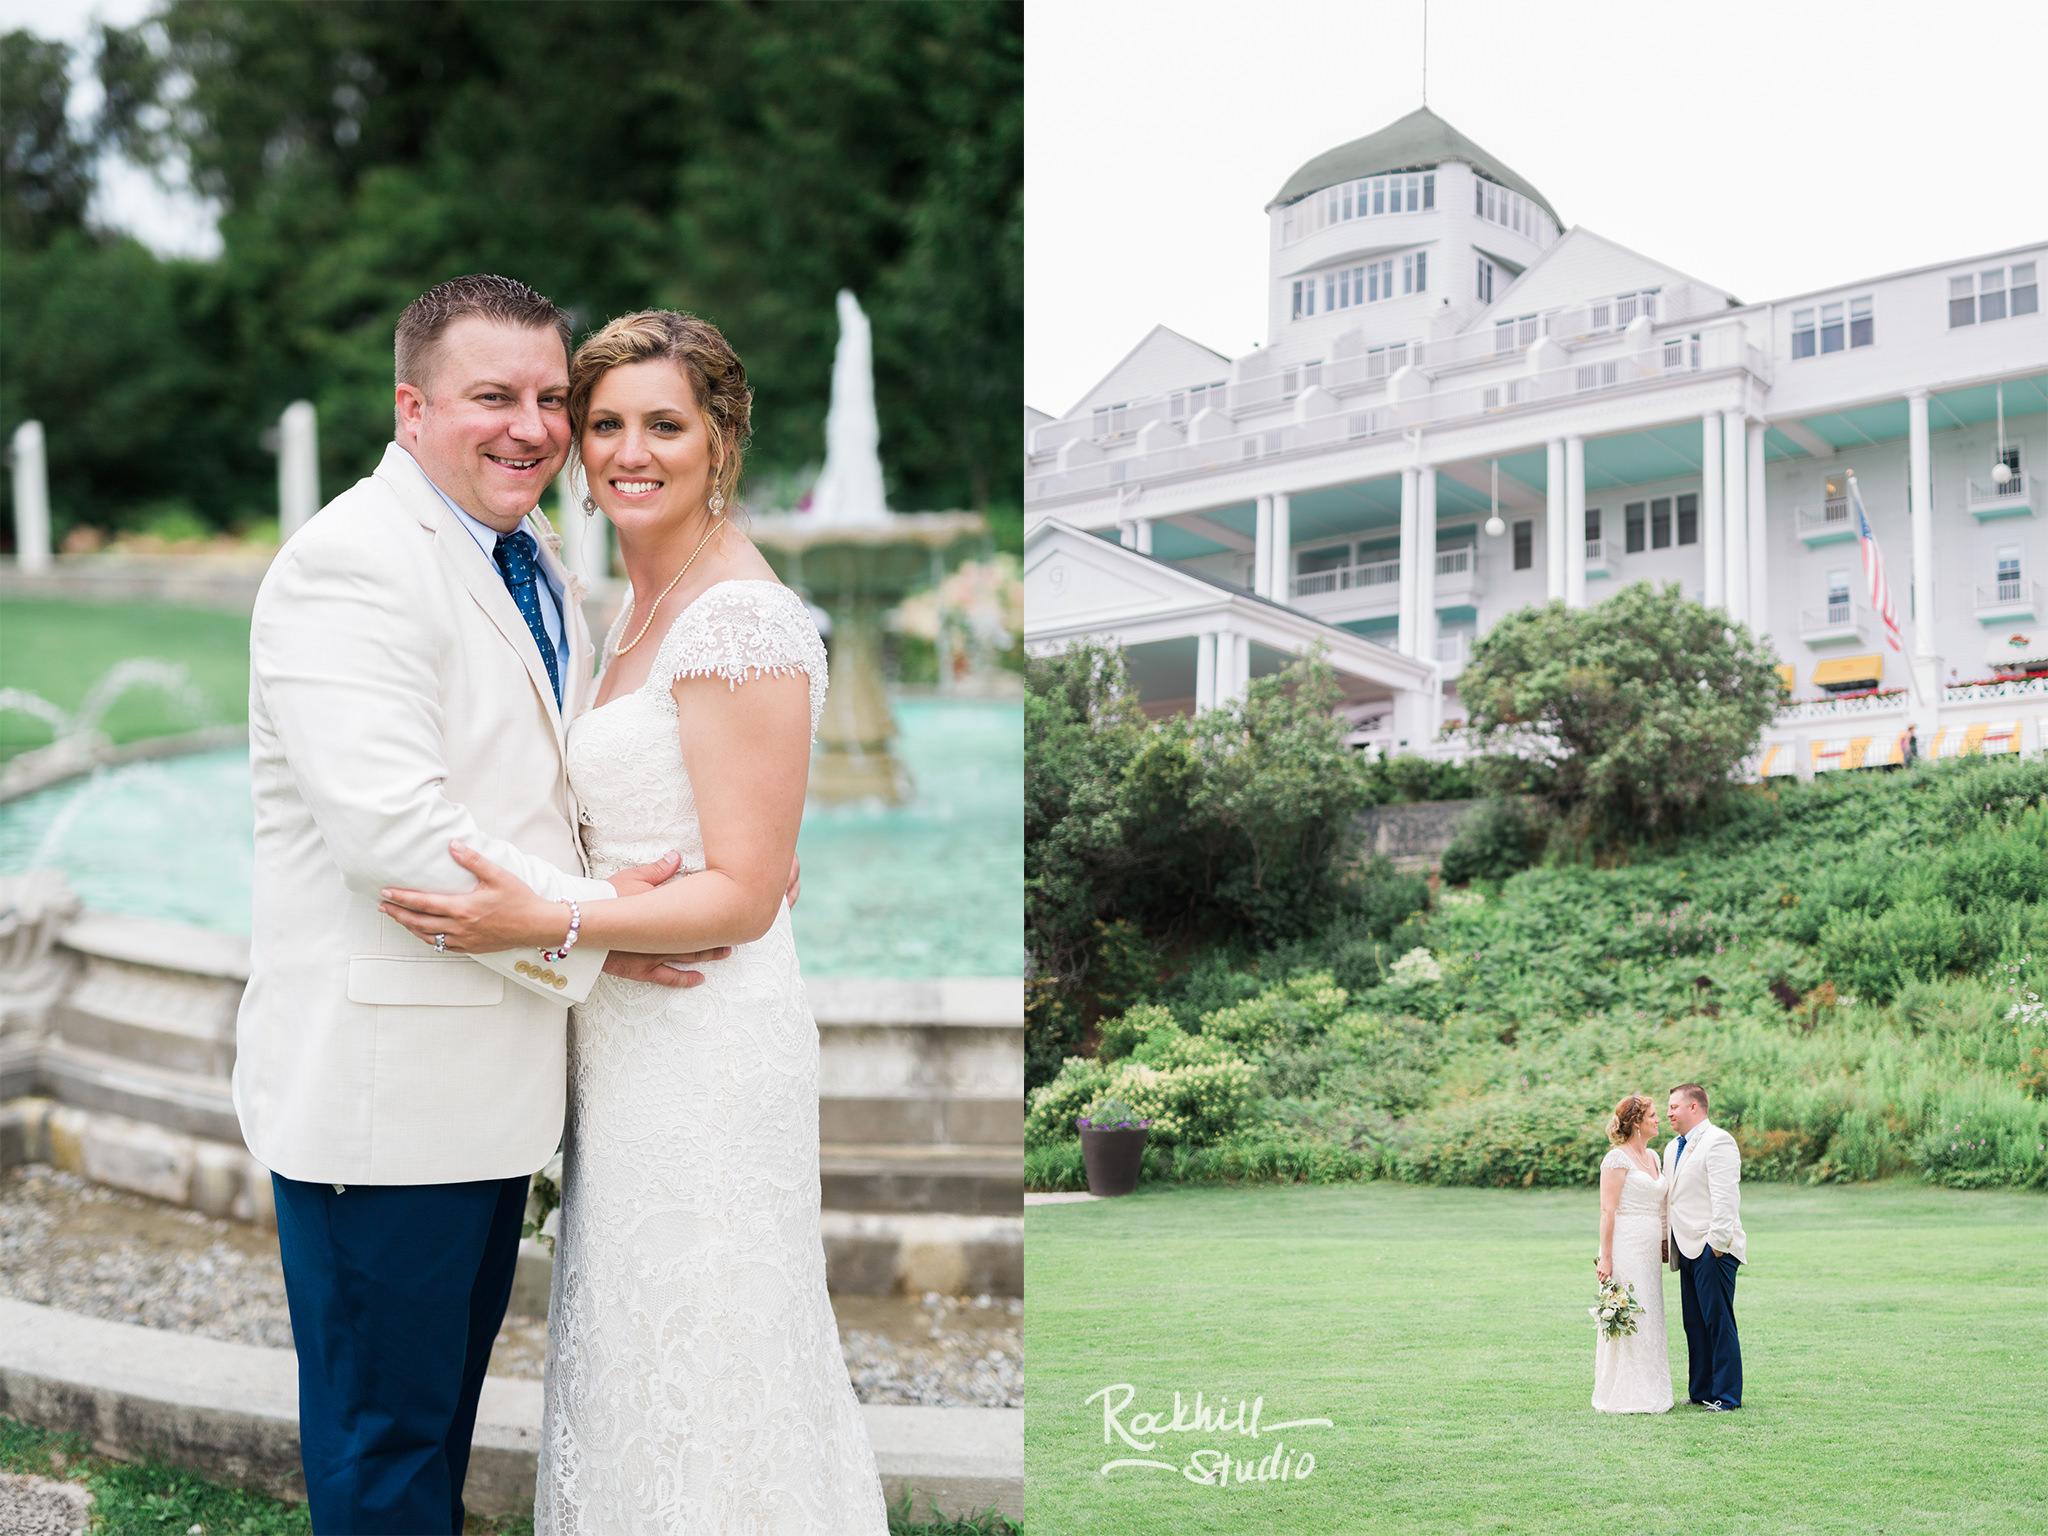 Grand Hotel Wedding, Mackinac Island horse drawn carriage, Traverse City Wedding Photographer Rockhill Studio